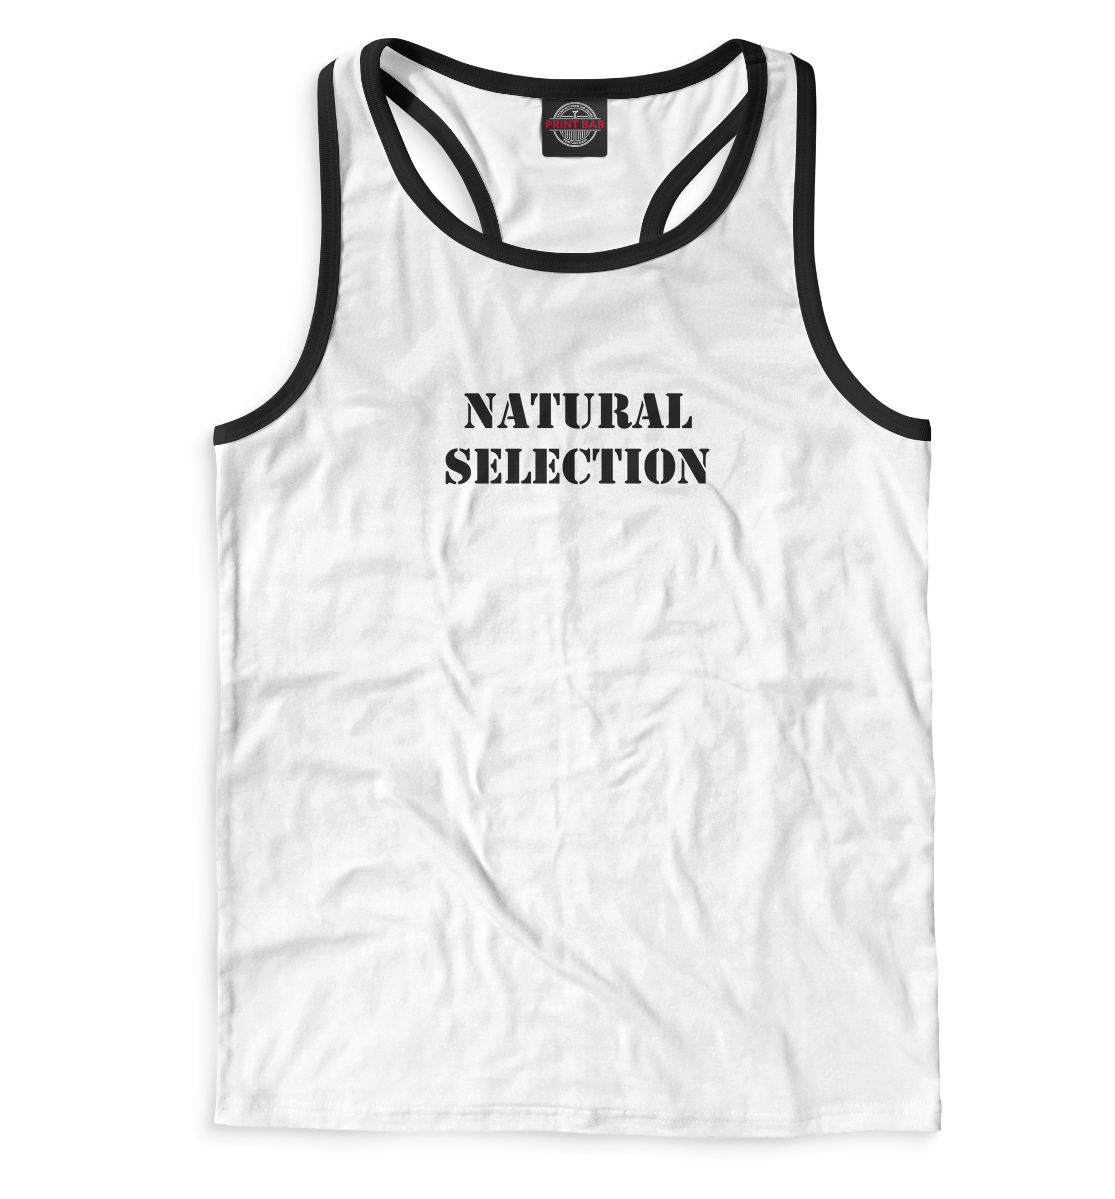 Natural Selection White